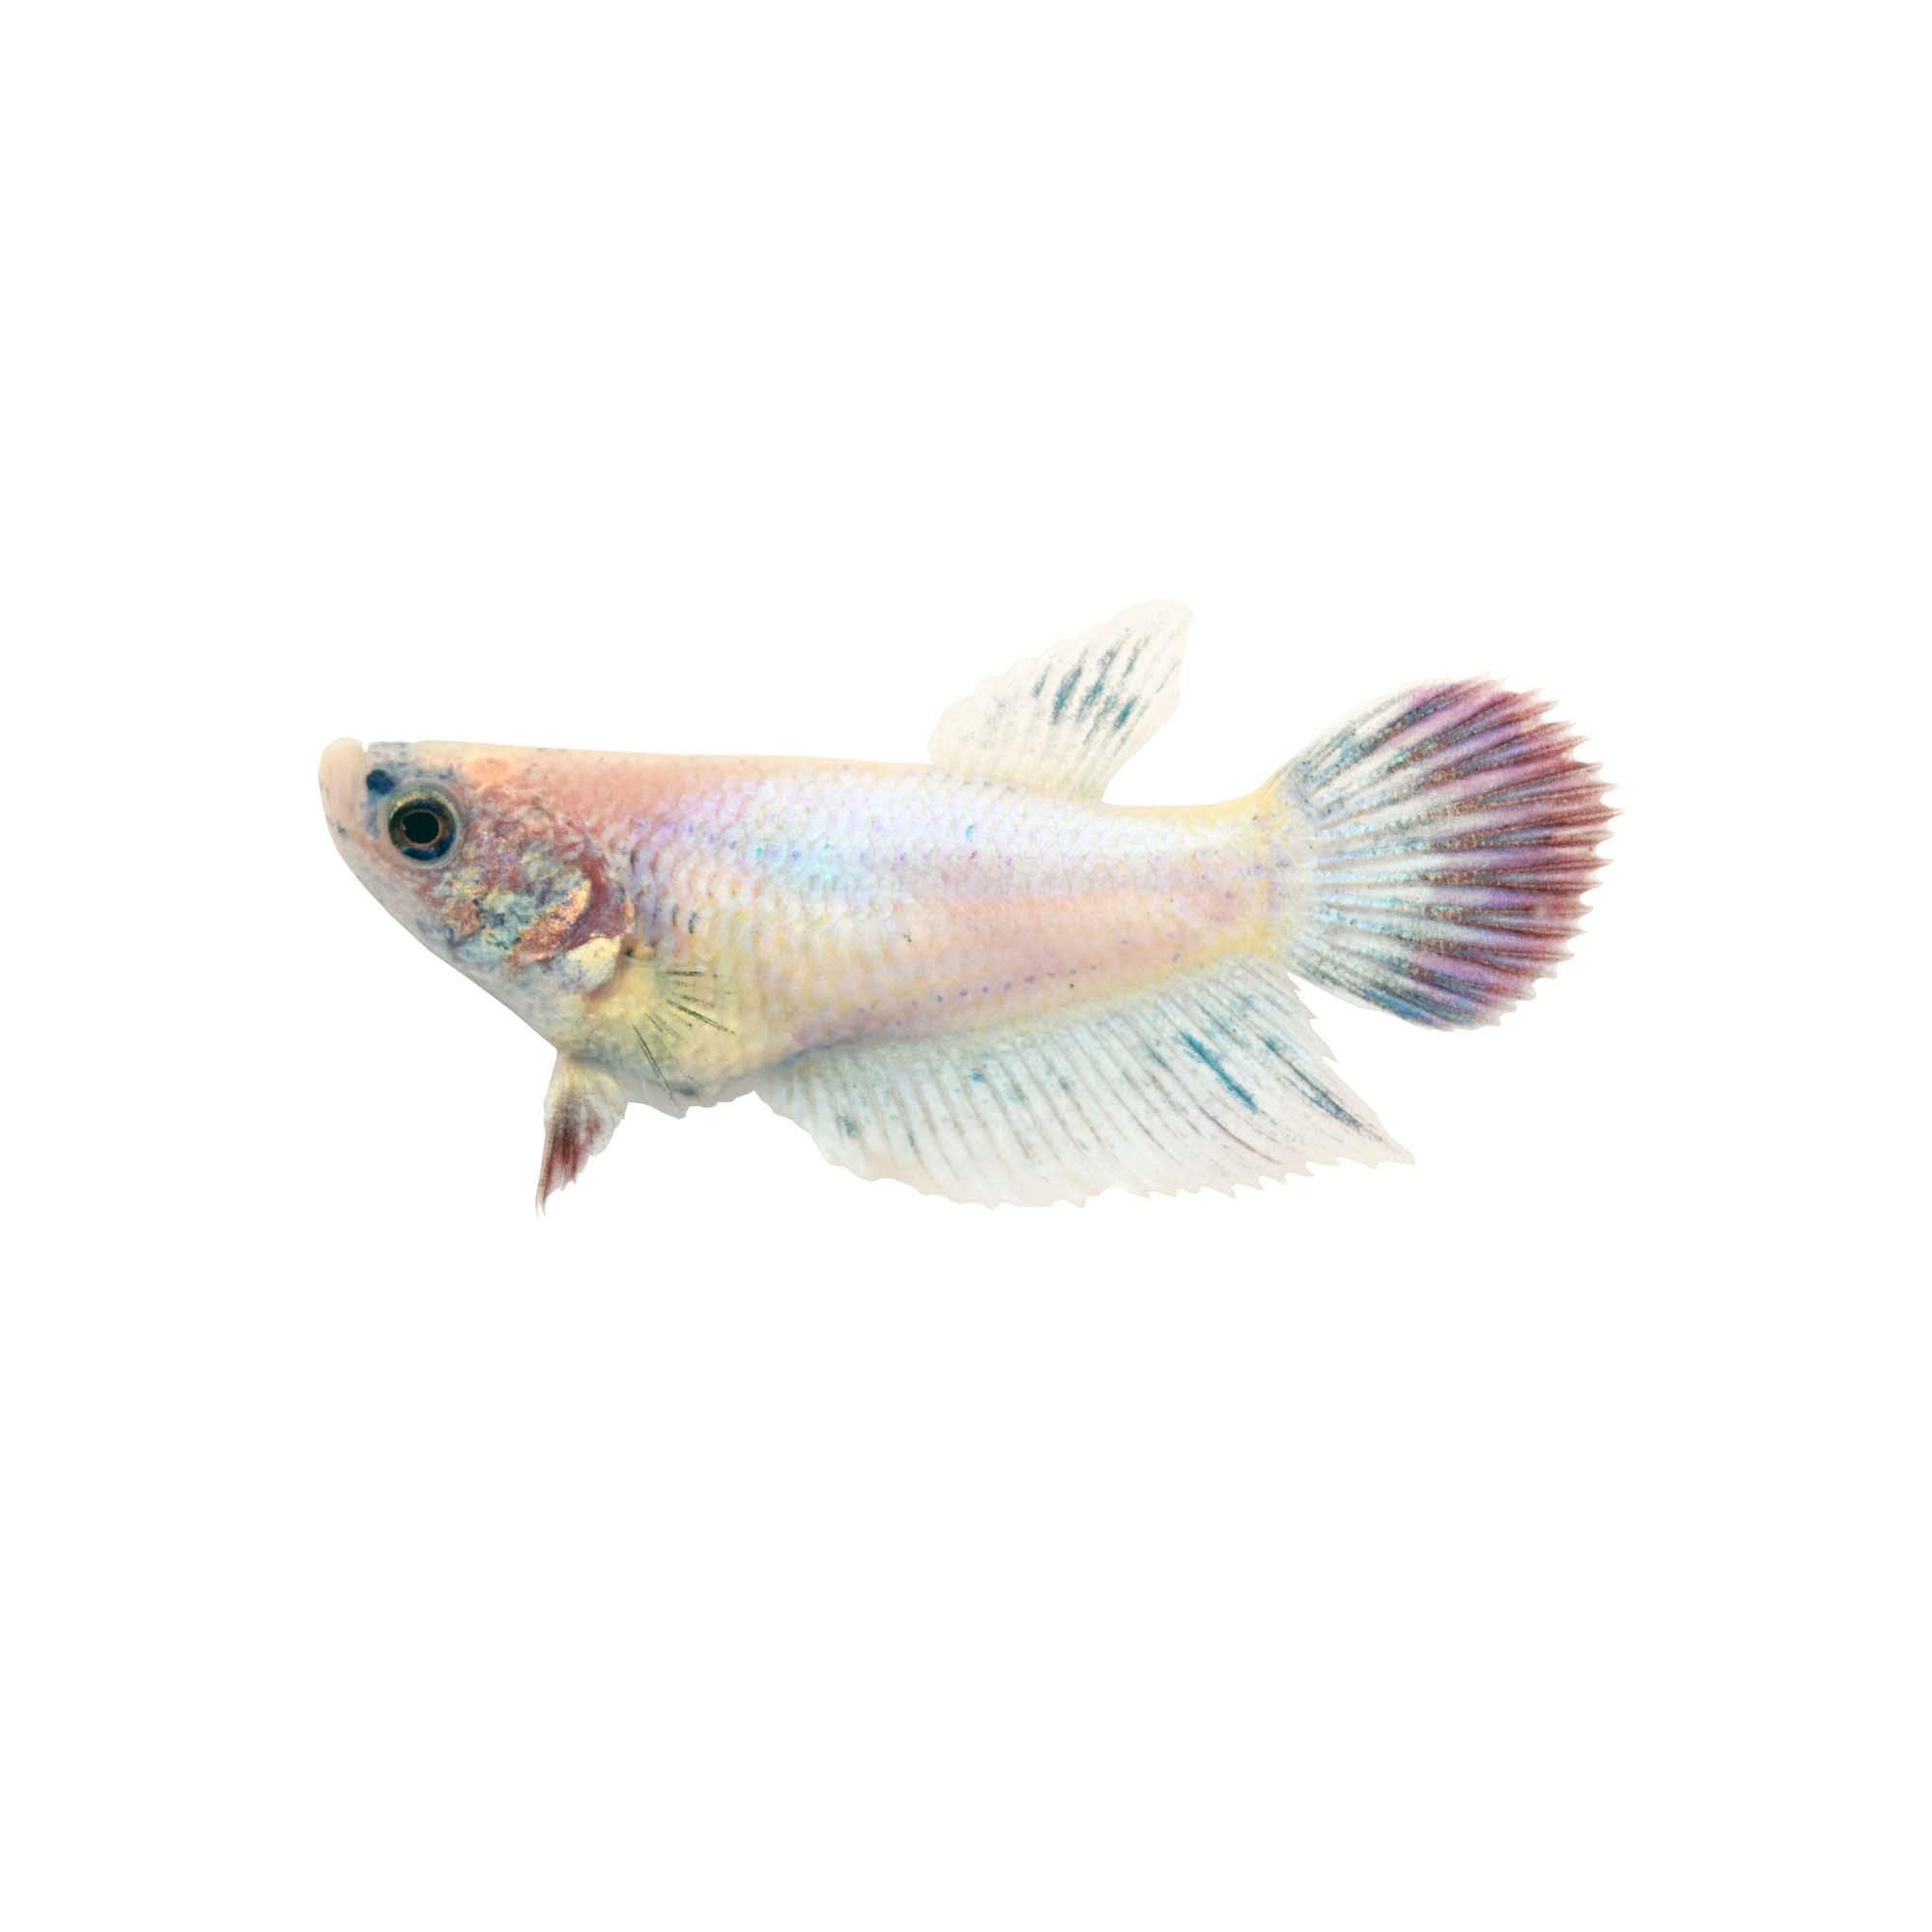 Female Veiltail Betta Fish Siamese Fighting Fish Extra Large Petco